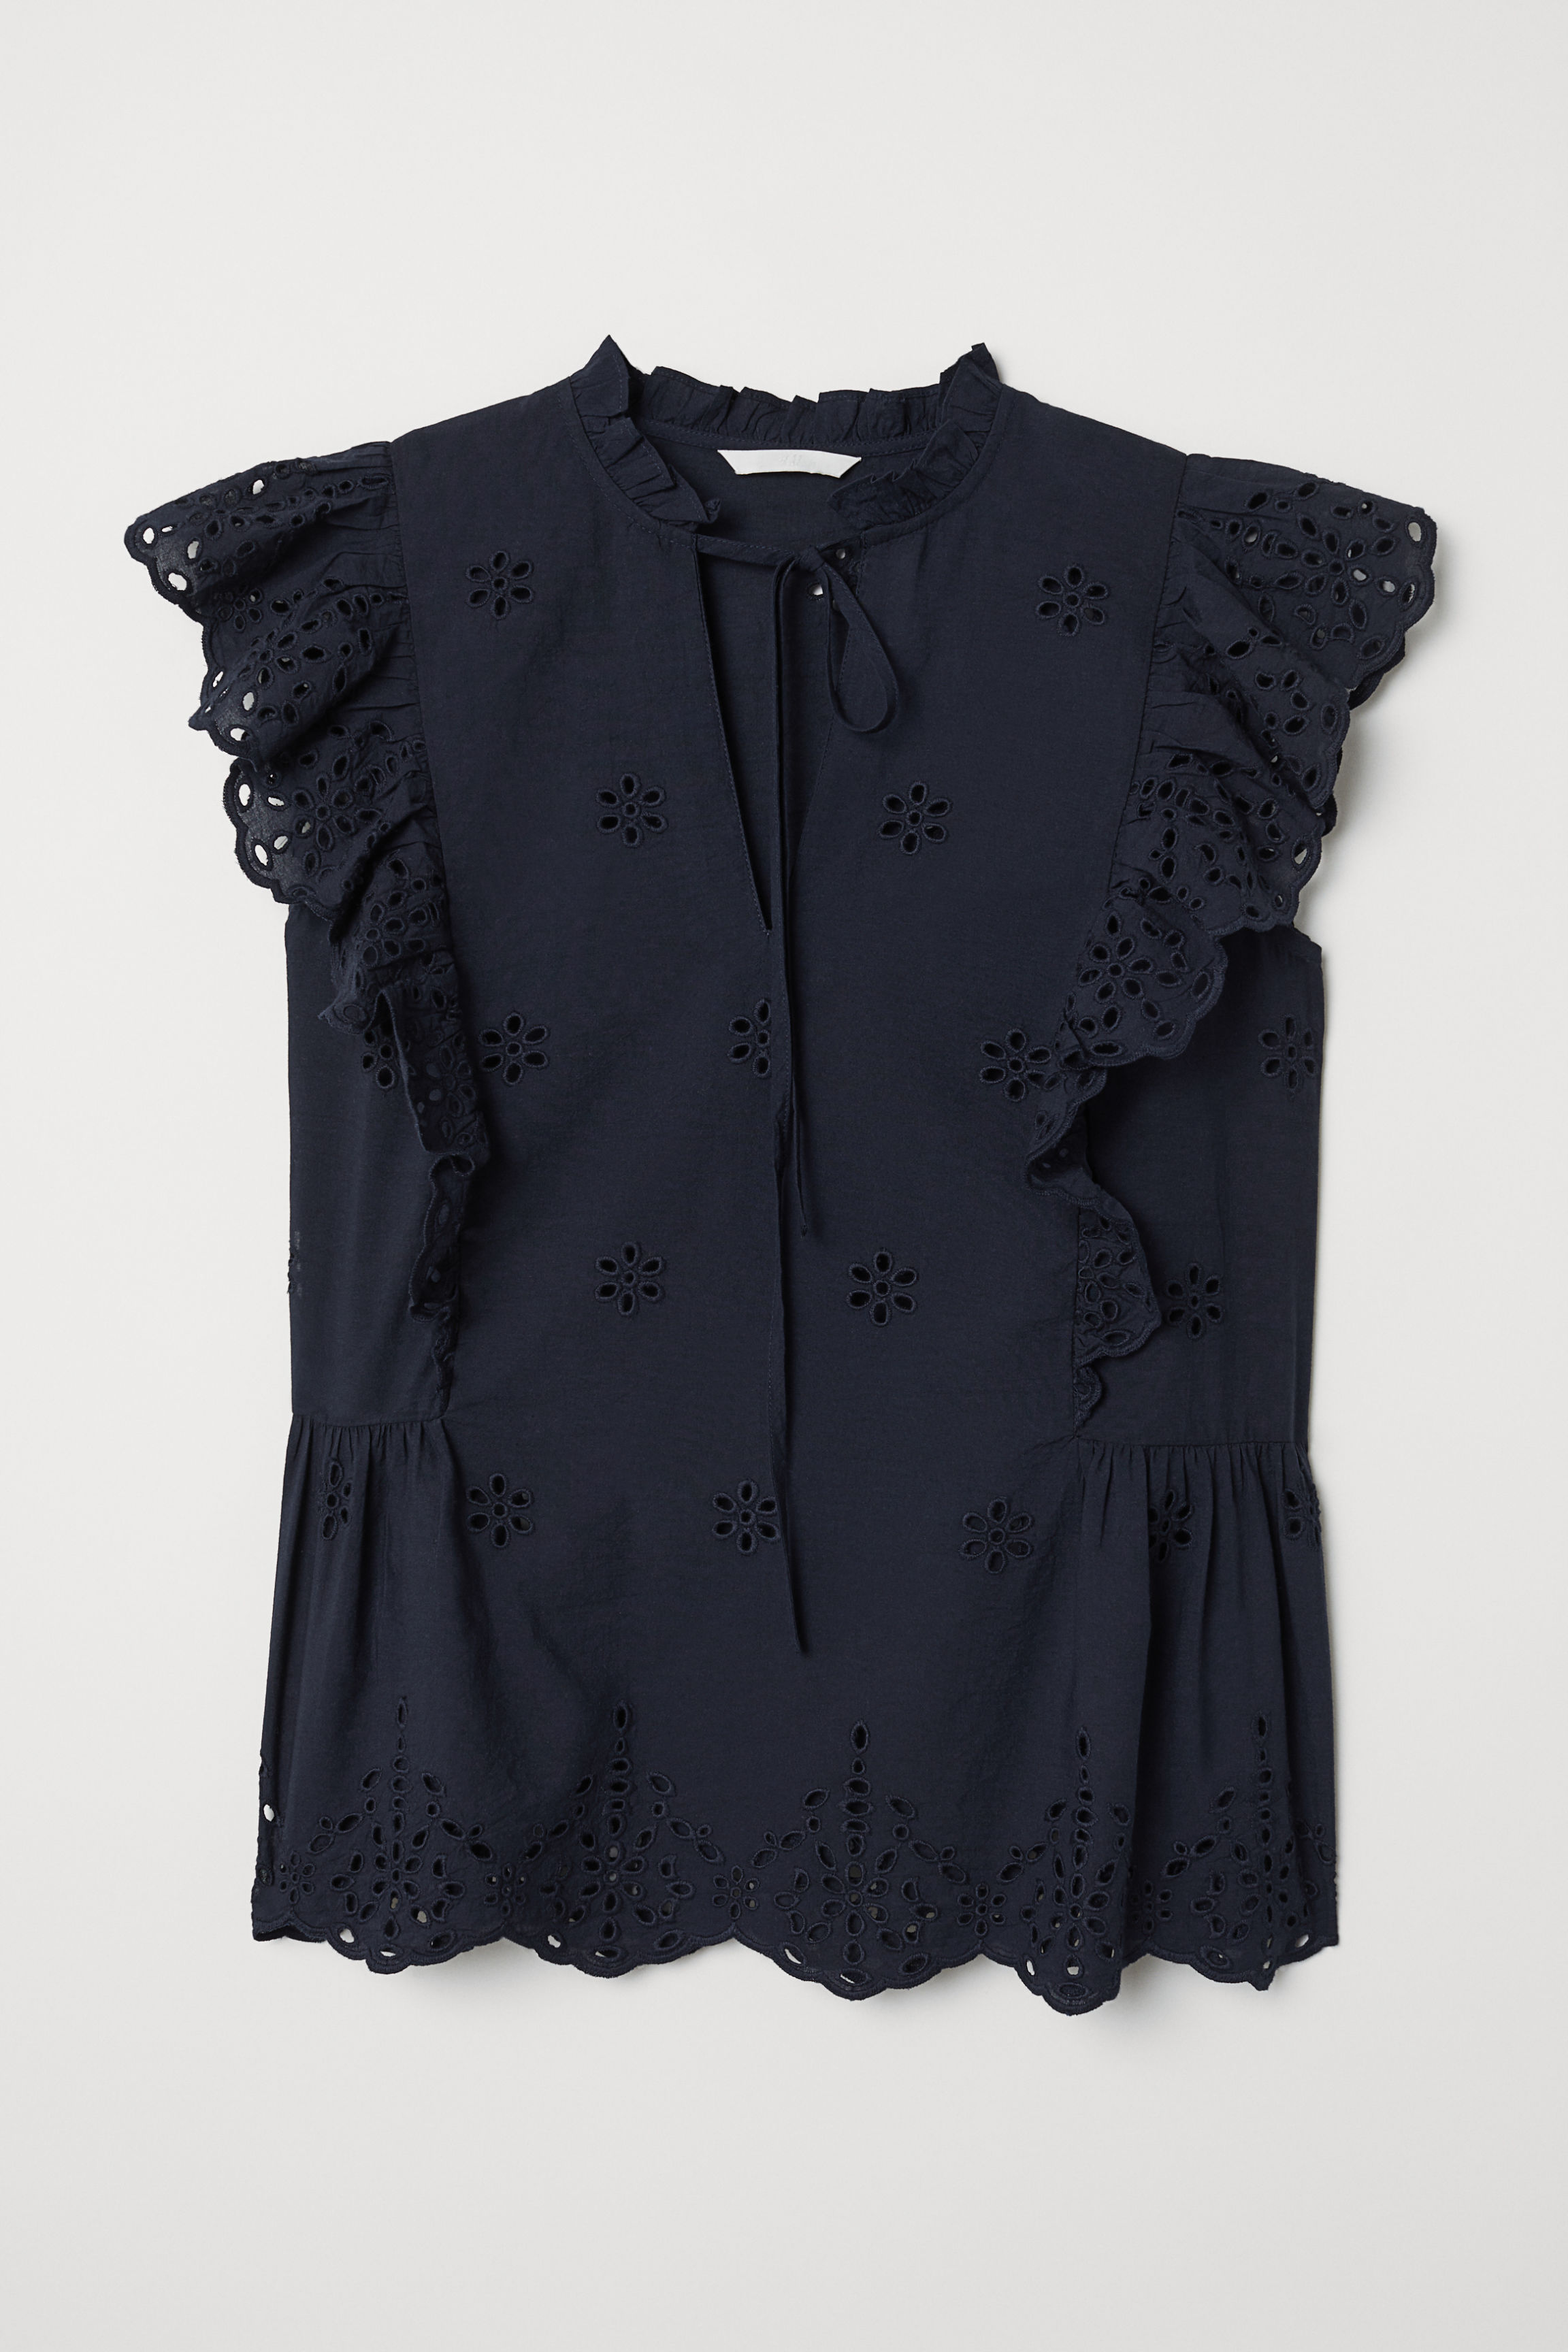 60672f67b5 White Ruffle Shirt Hm